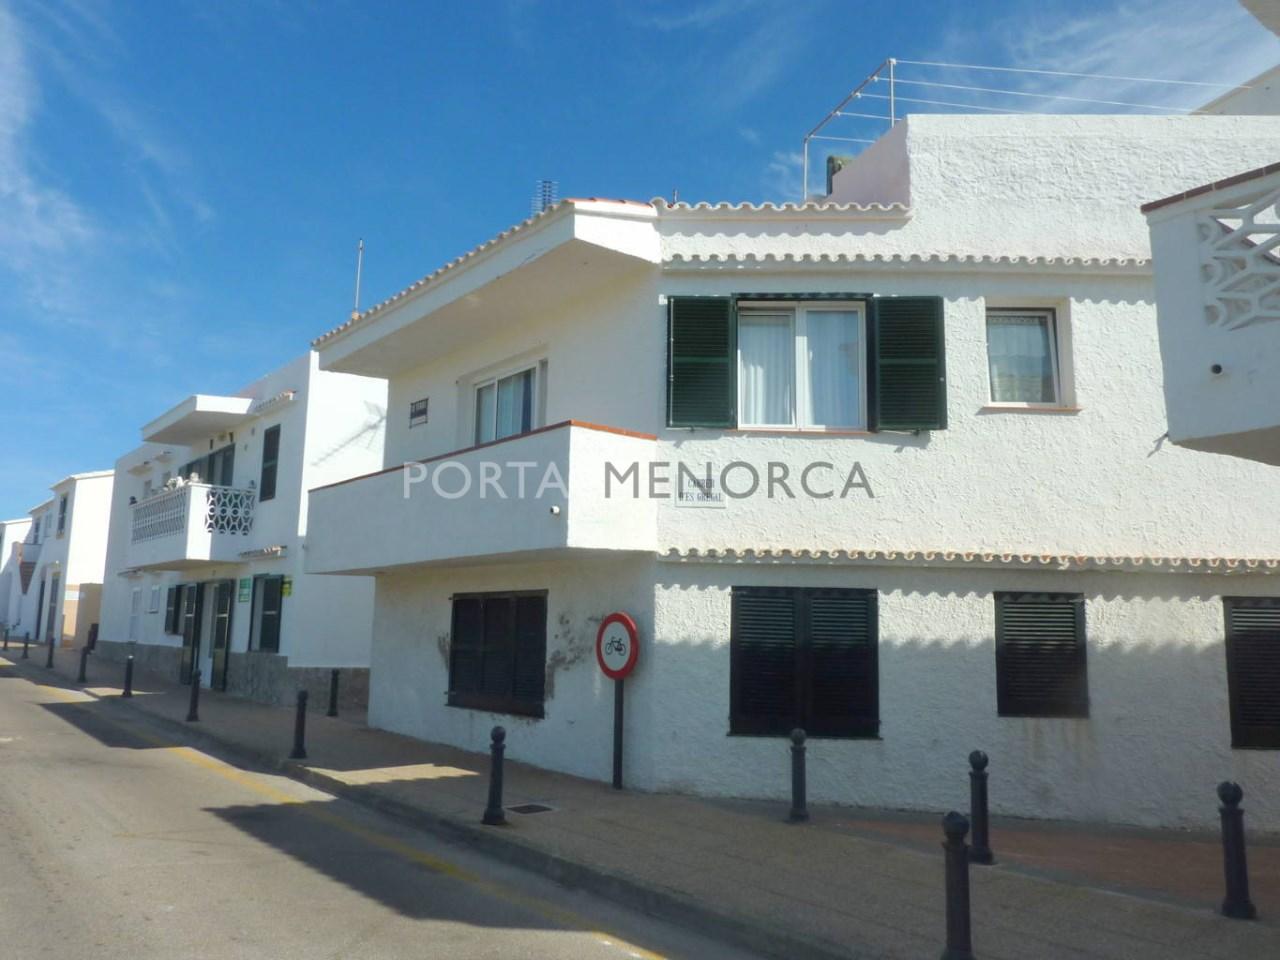 Apartment for sale in S'Algar, Menorca